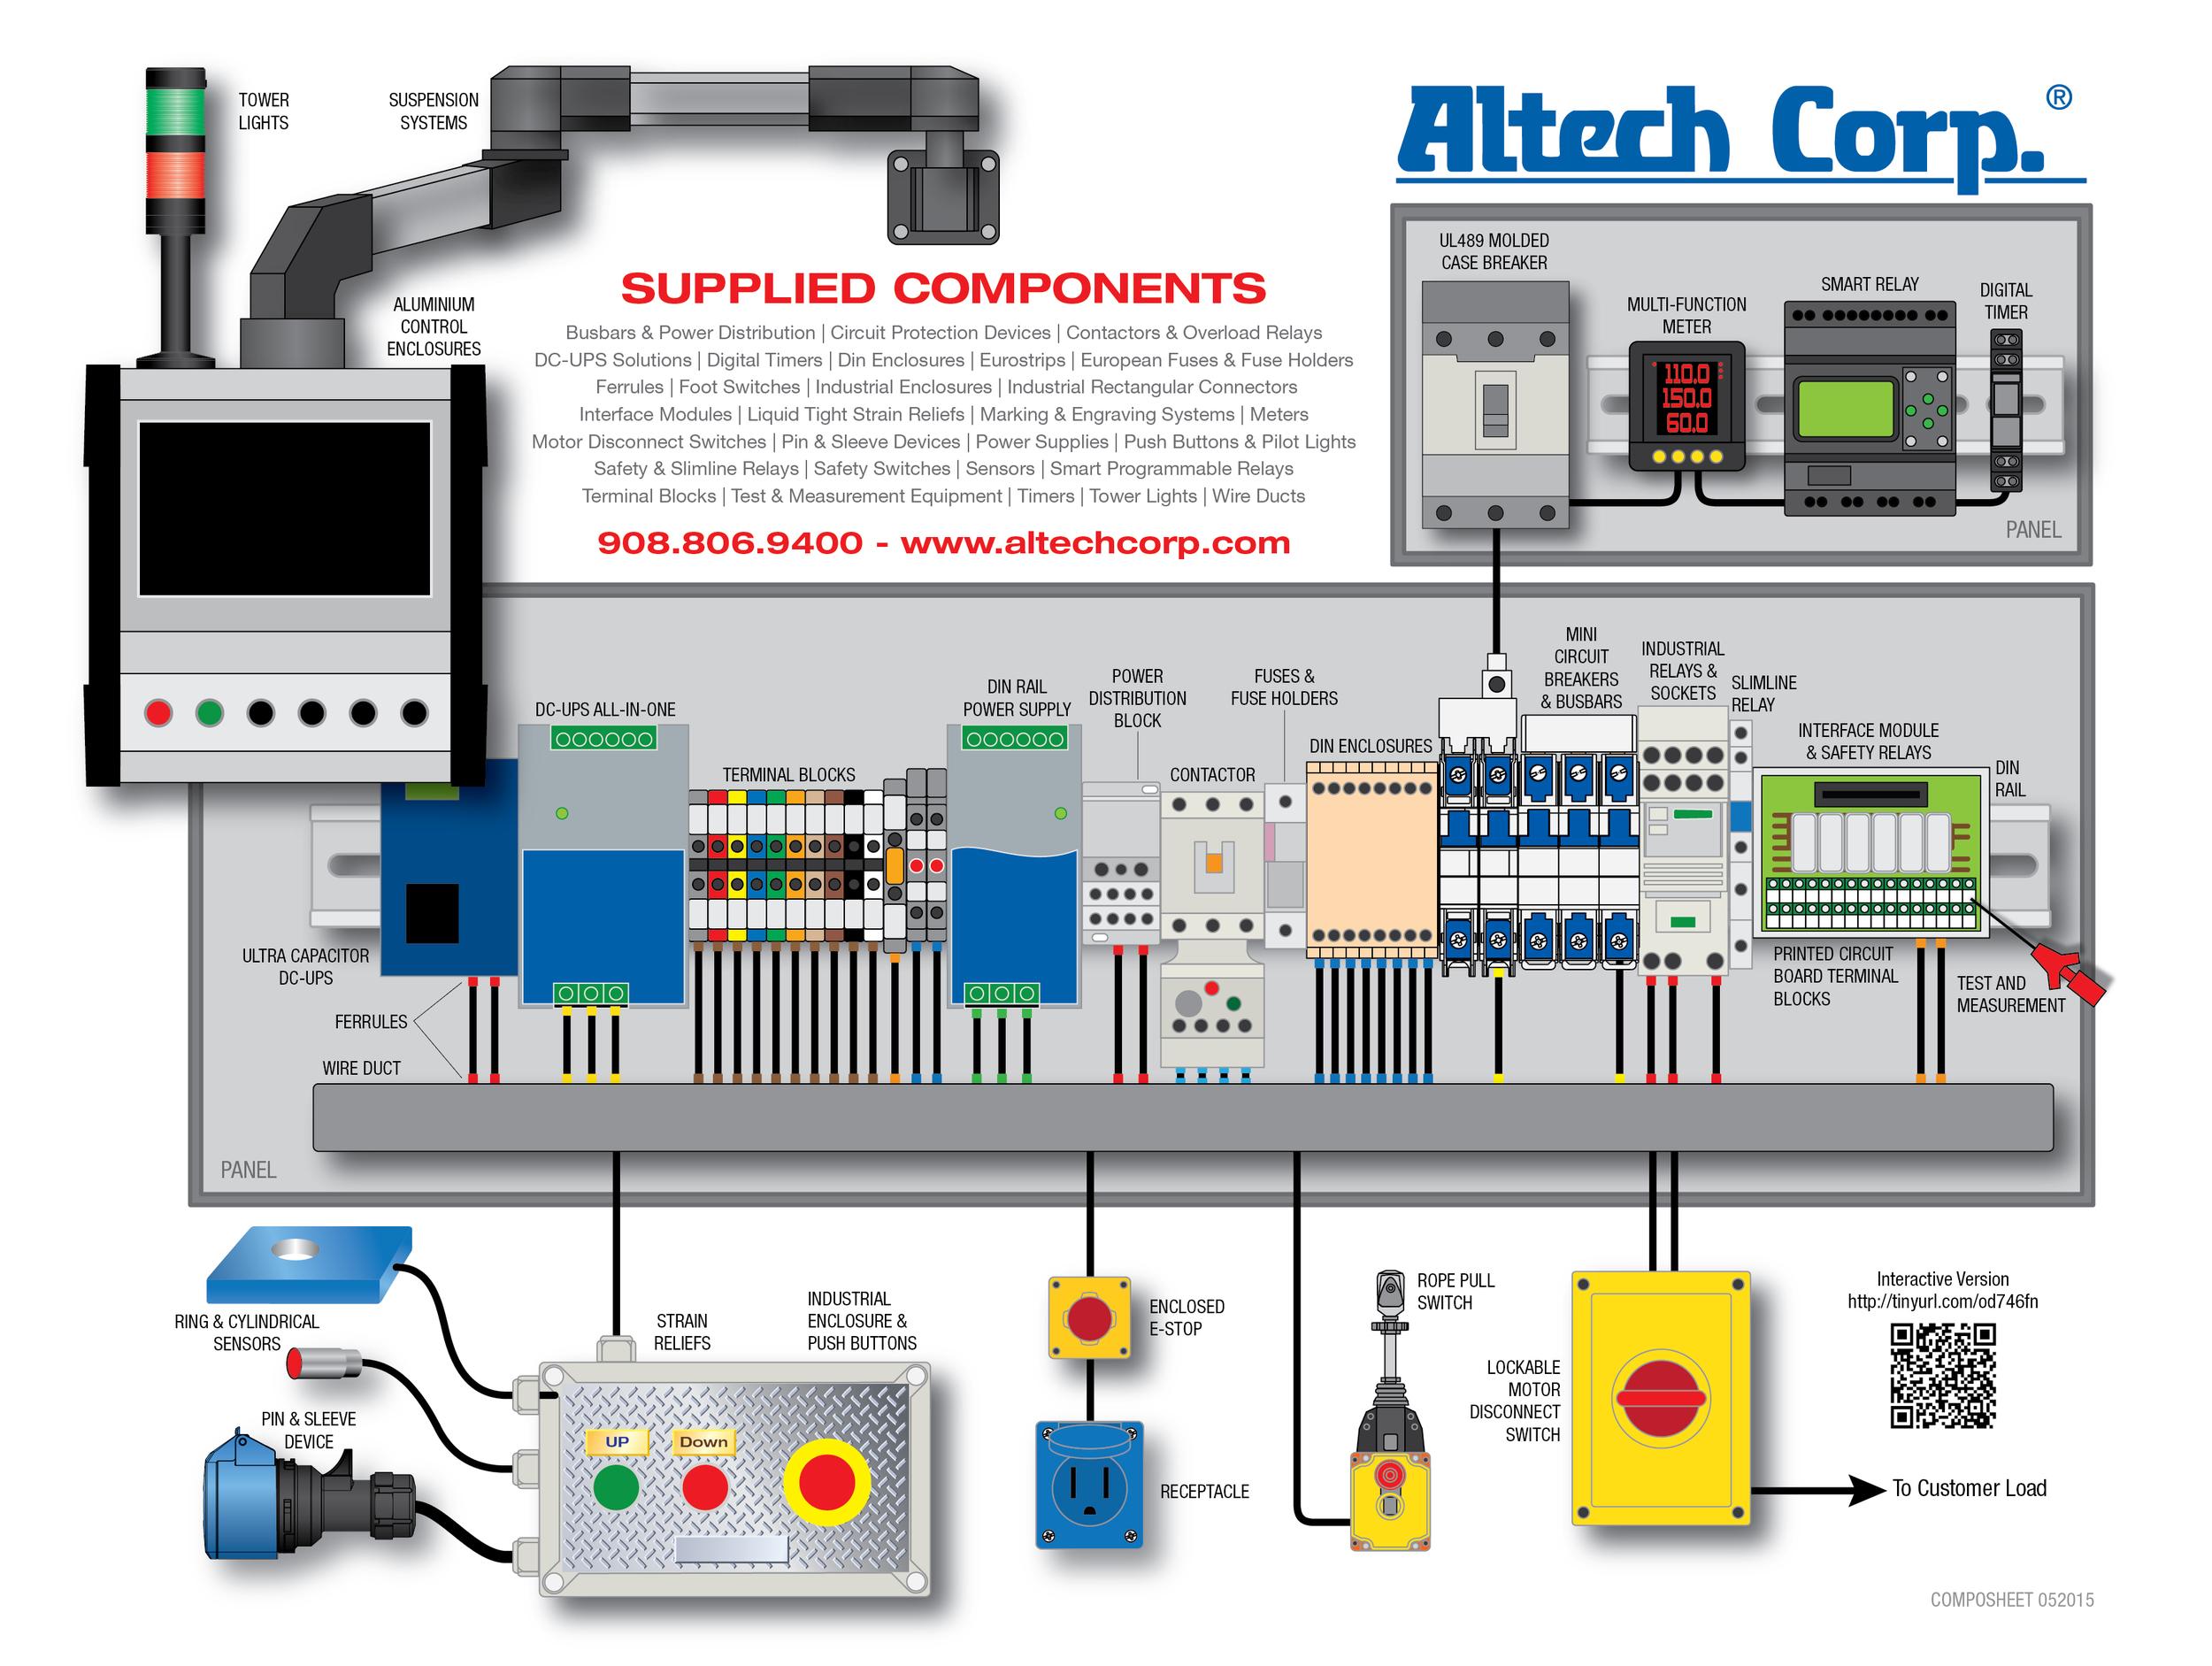 AltechComponentsInPanel-2(2015).jpg